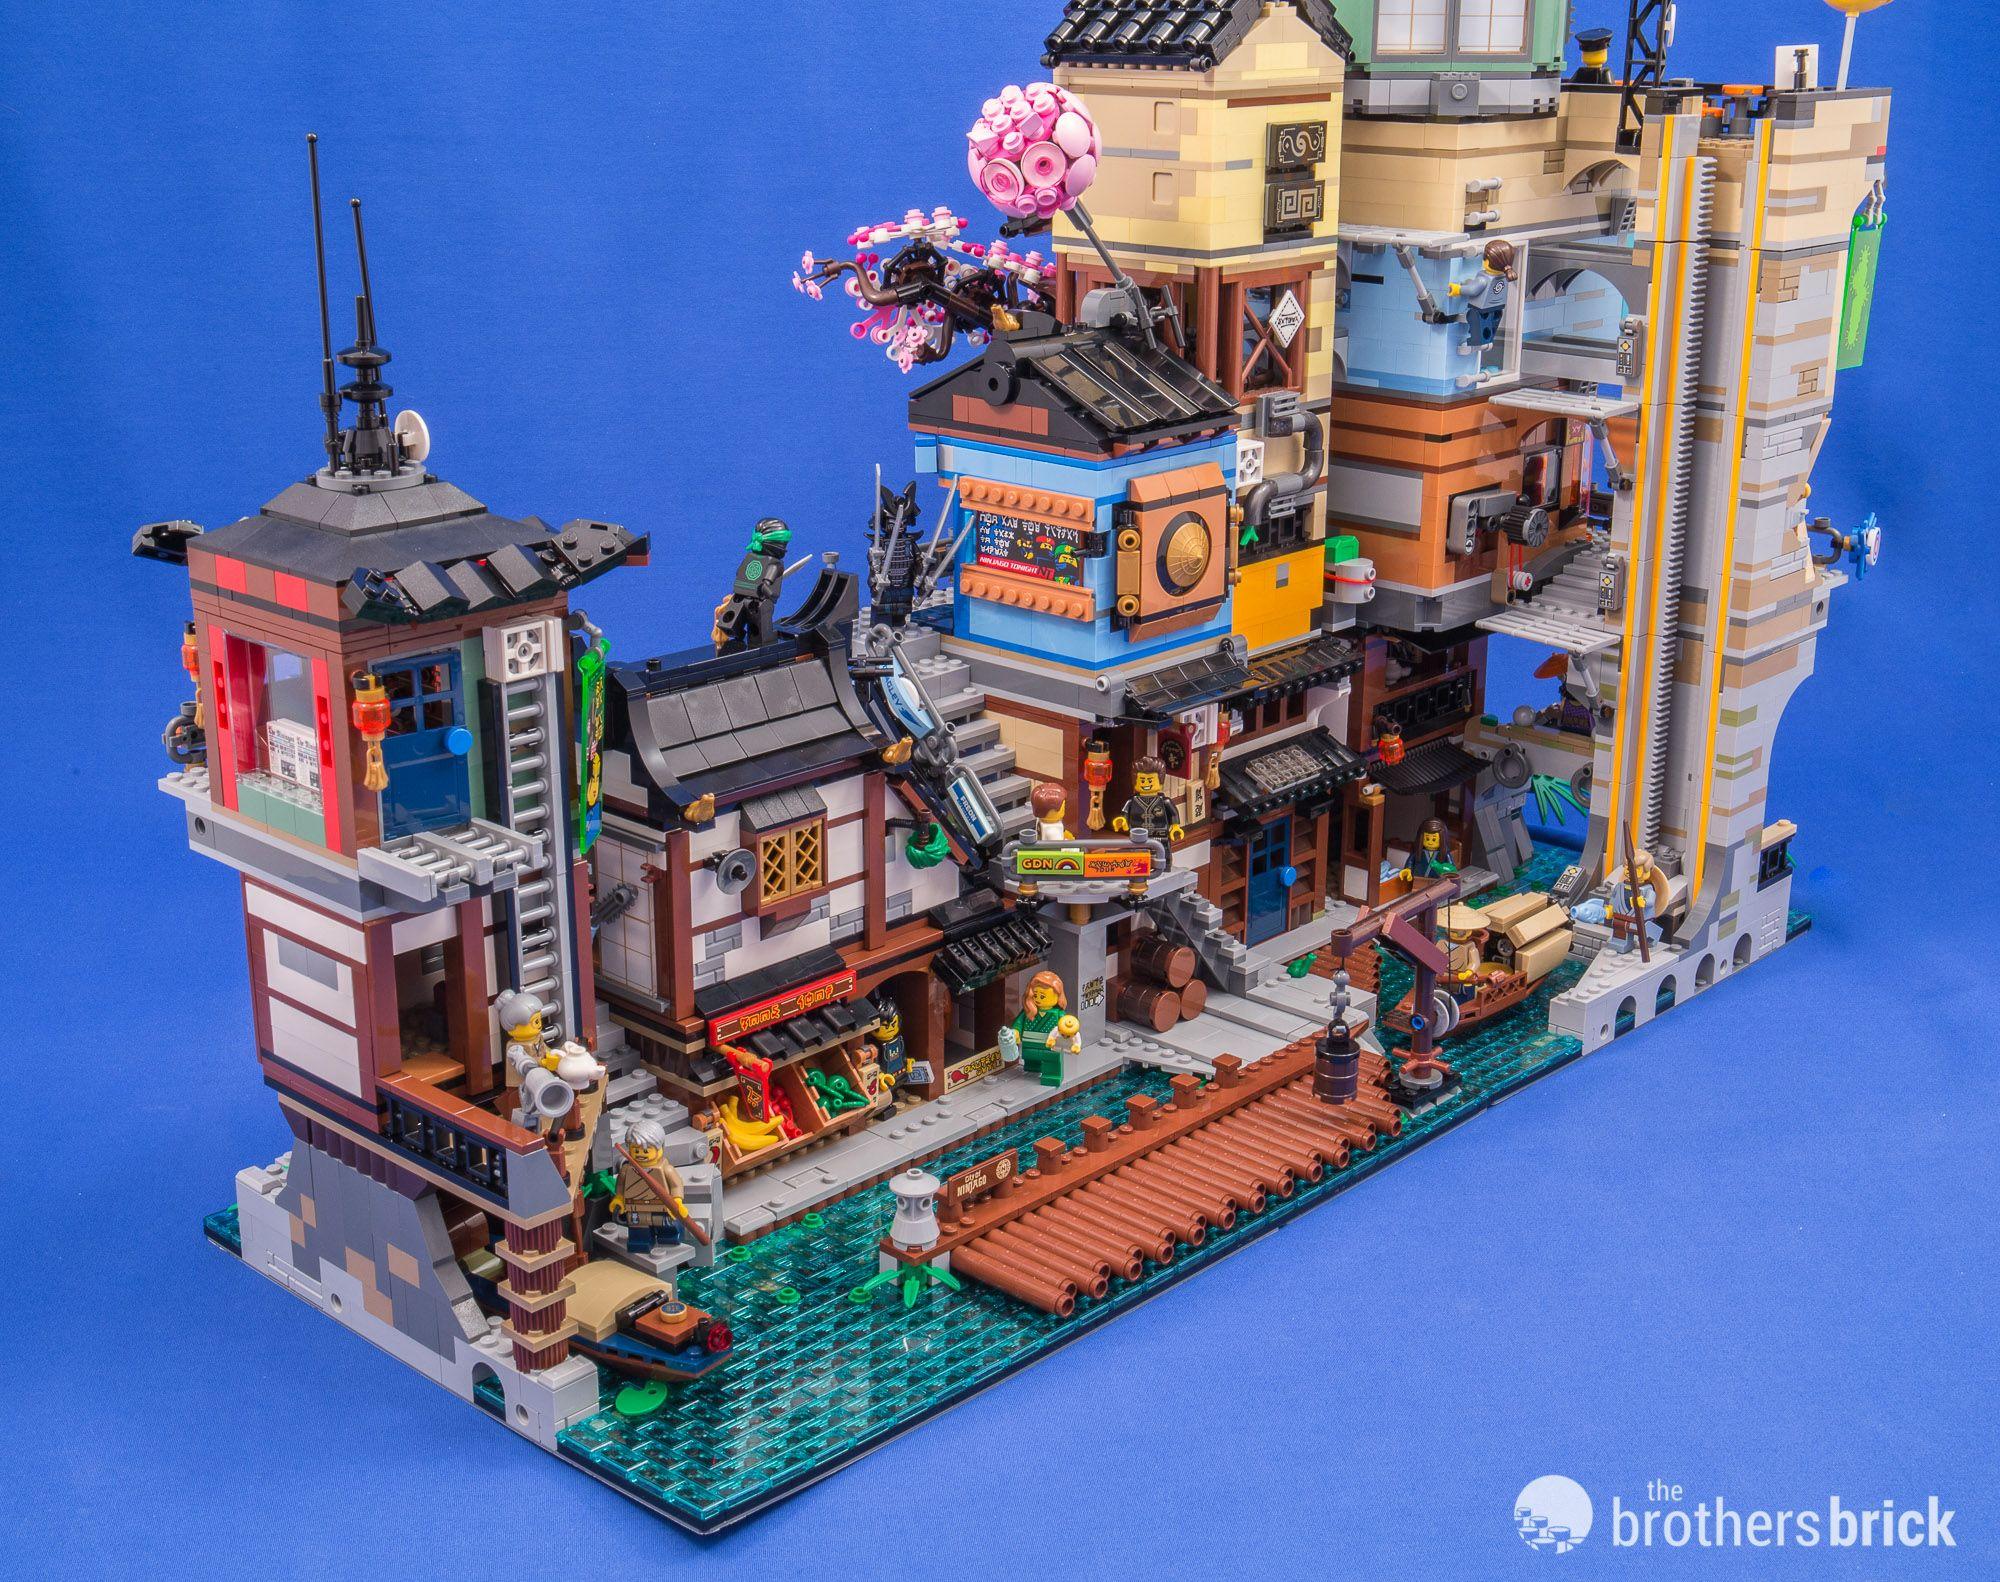 70657 Ninjago City Docks 45 Jpg 2 000 1 582 Pixels Lego Ninjago City Lego Architecture Lego Pictures